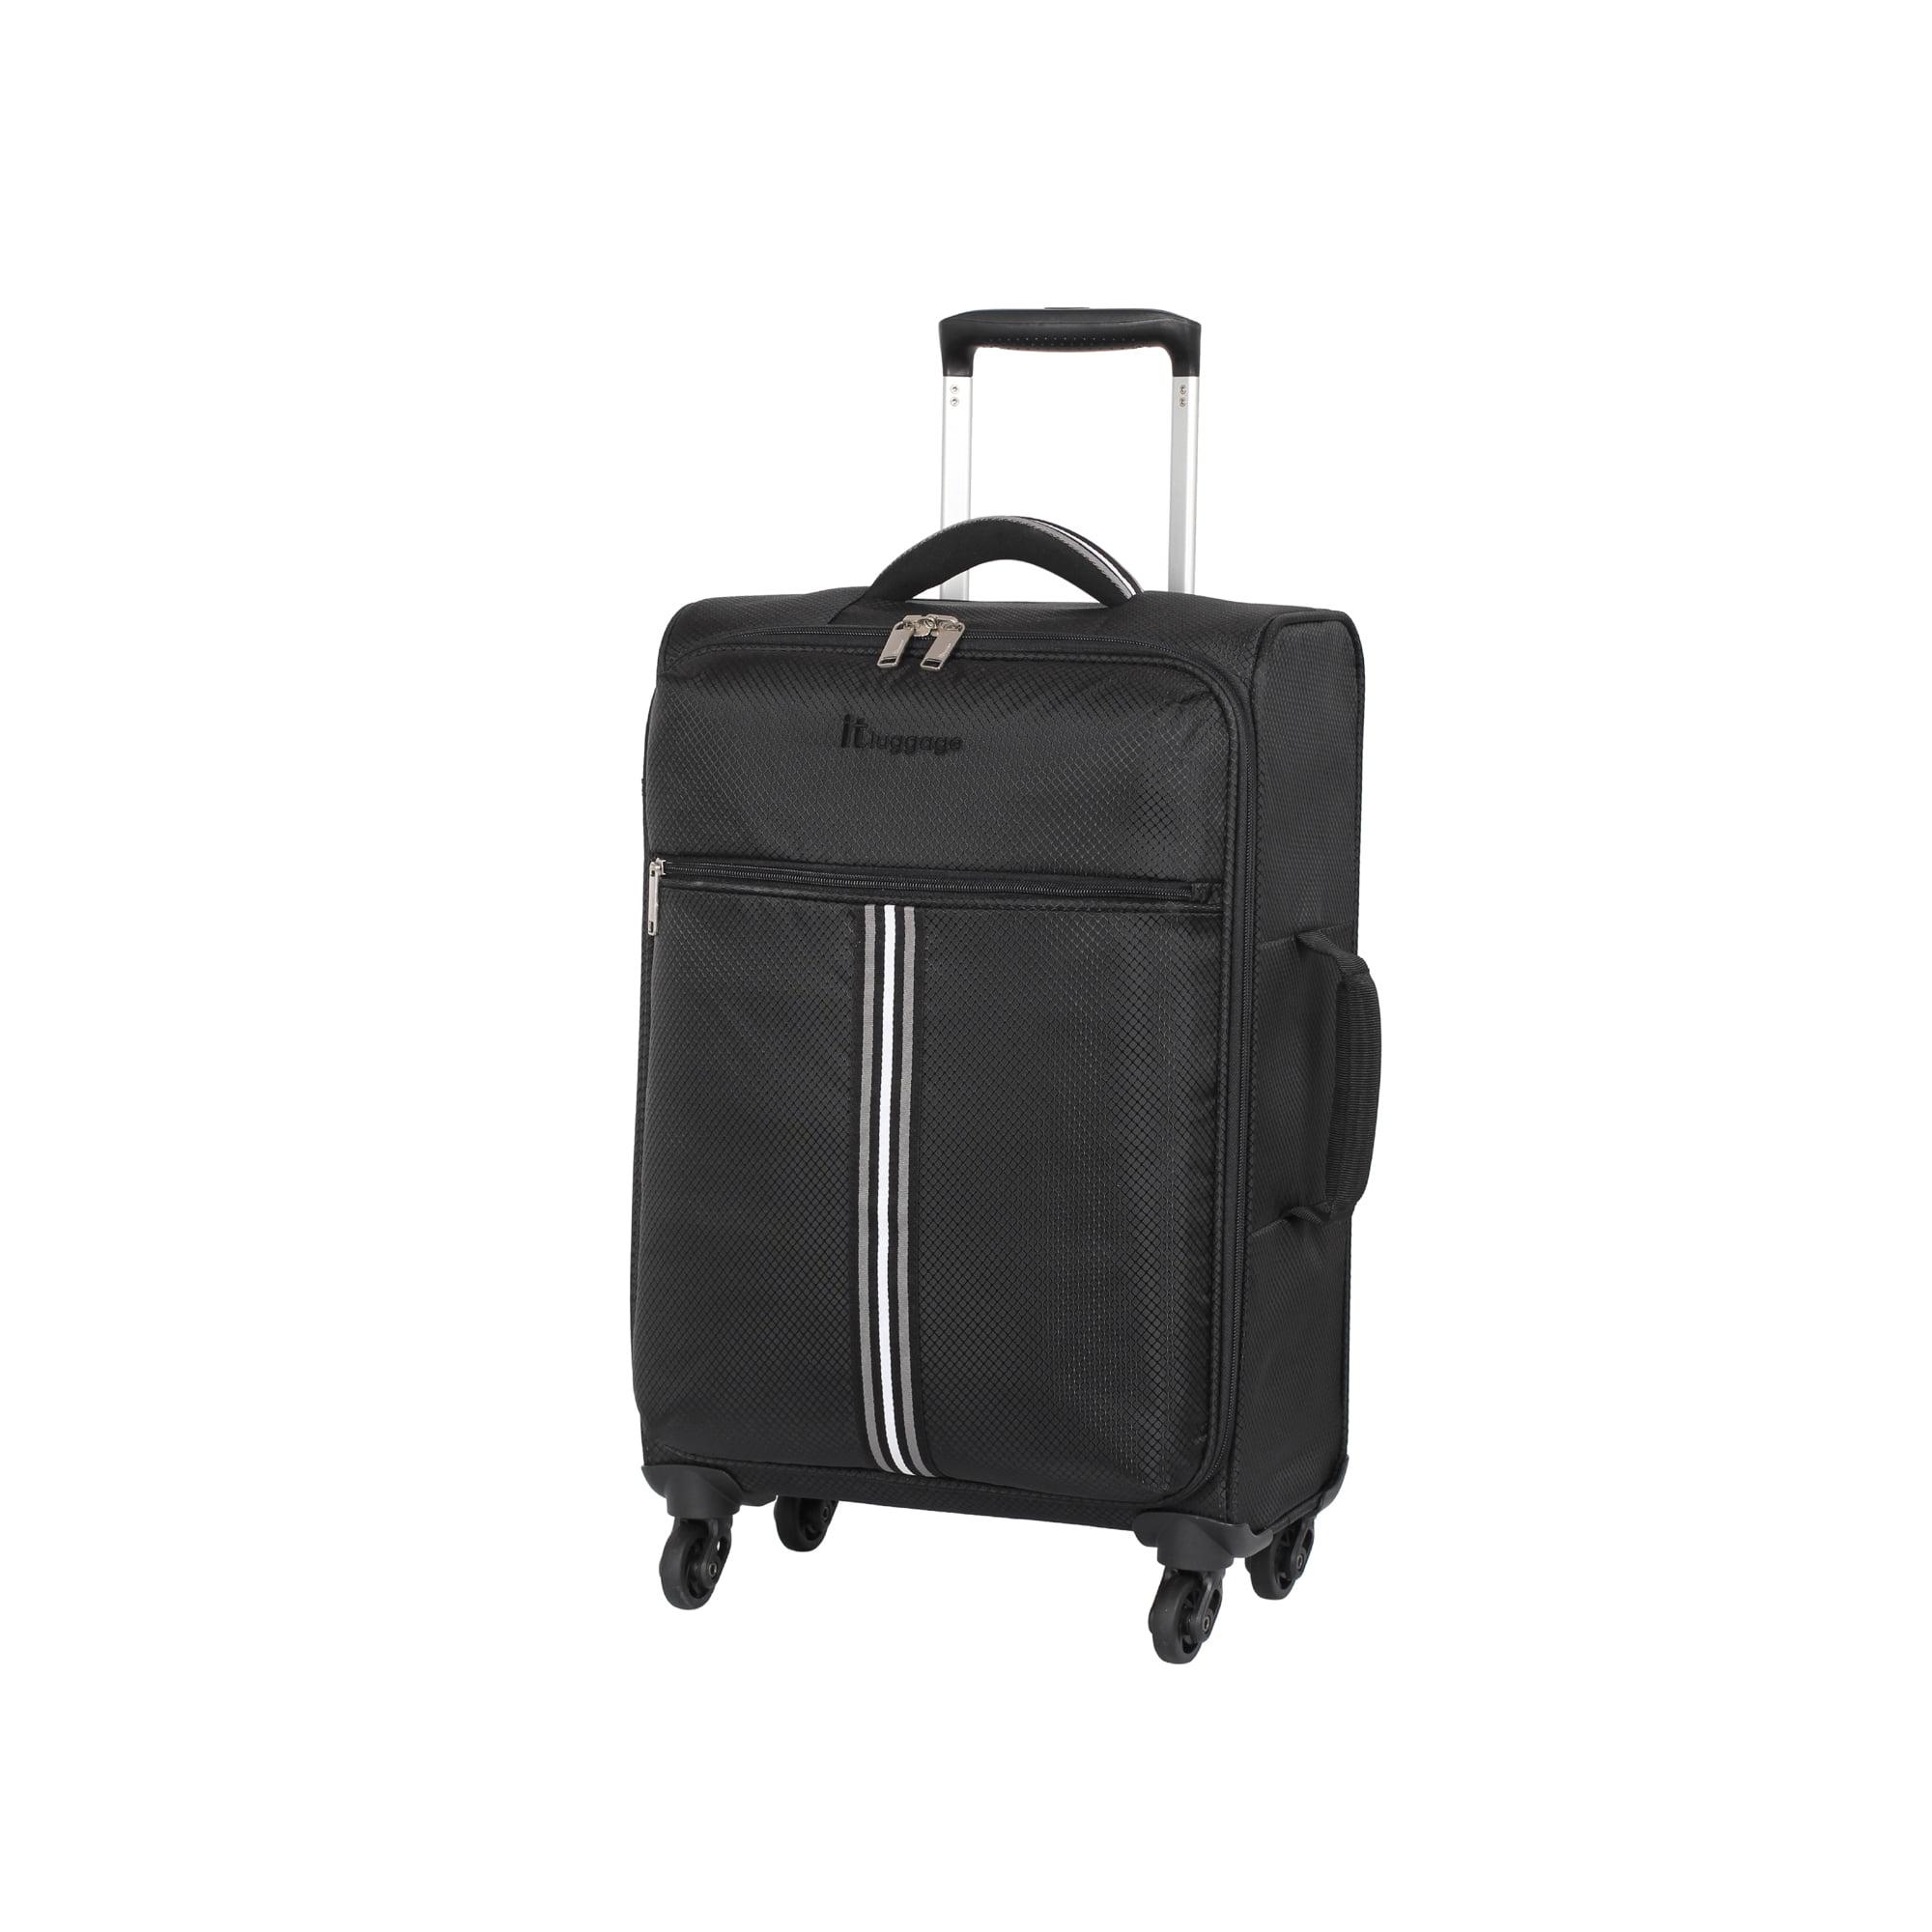 CANDY CANE CHRISTMAS Gift Nylon Suitcase Belt Luggage Tage Set to Keep Your Luggage Organized and Secure Travel Luggage Strap Adjustable